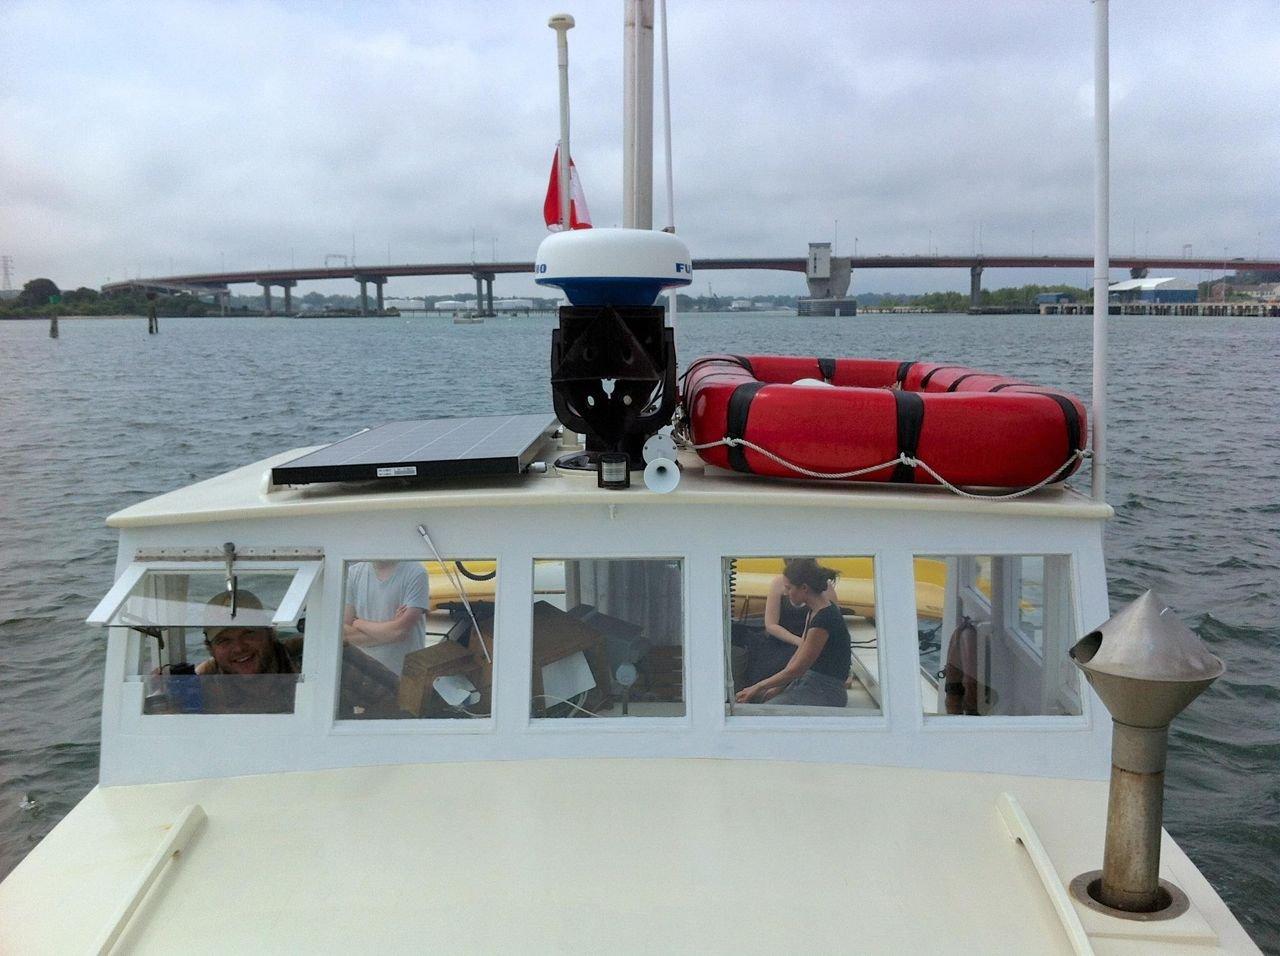 M/V MONHEGAN departing Portland Harbor